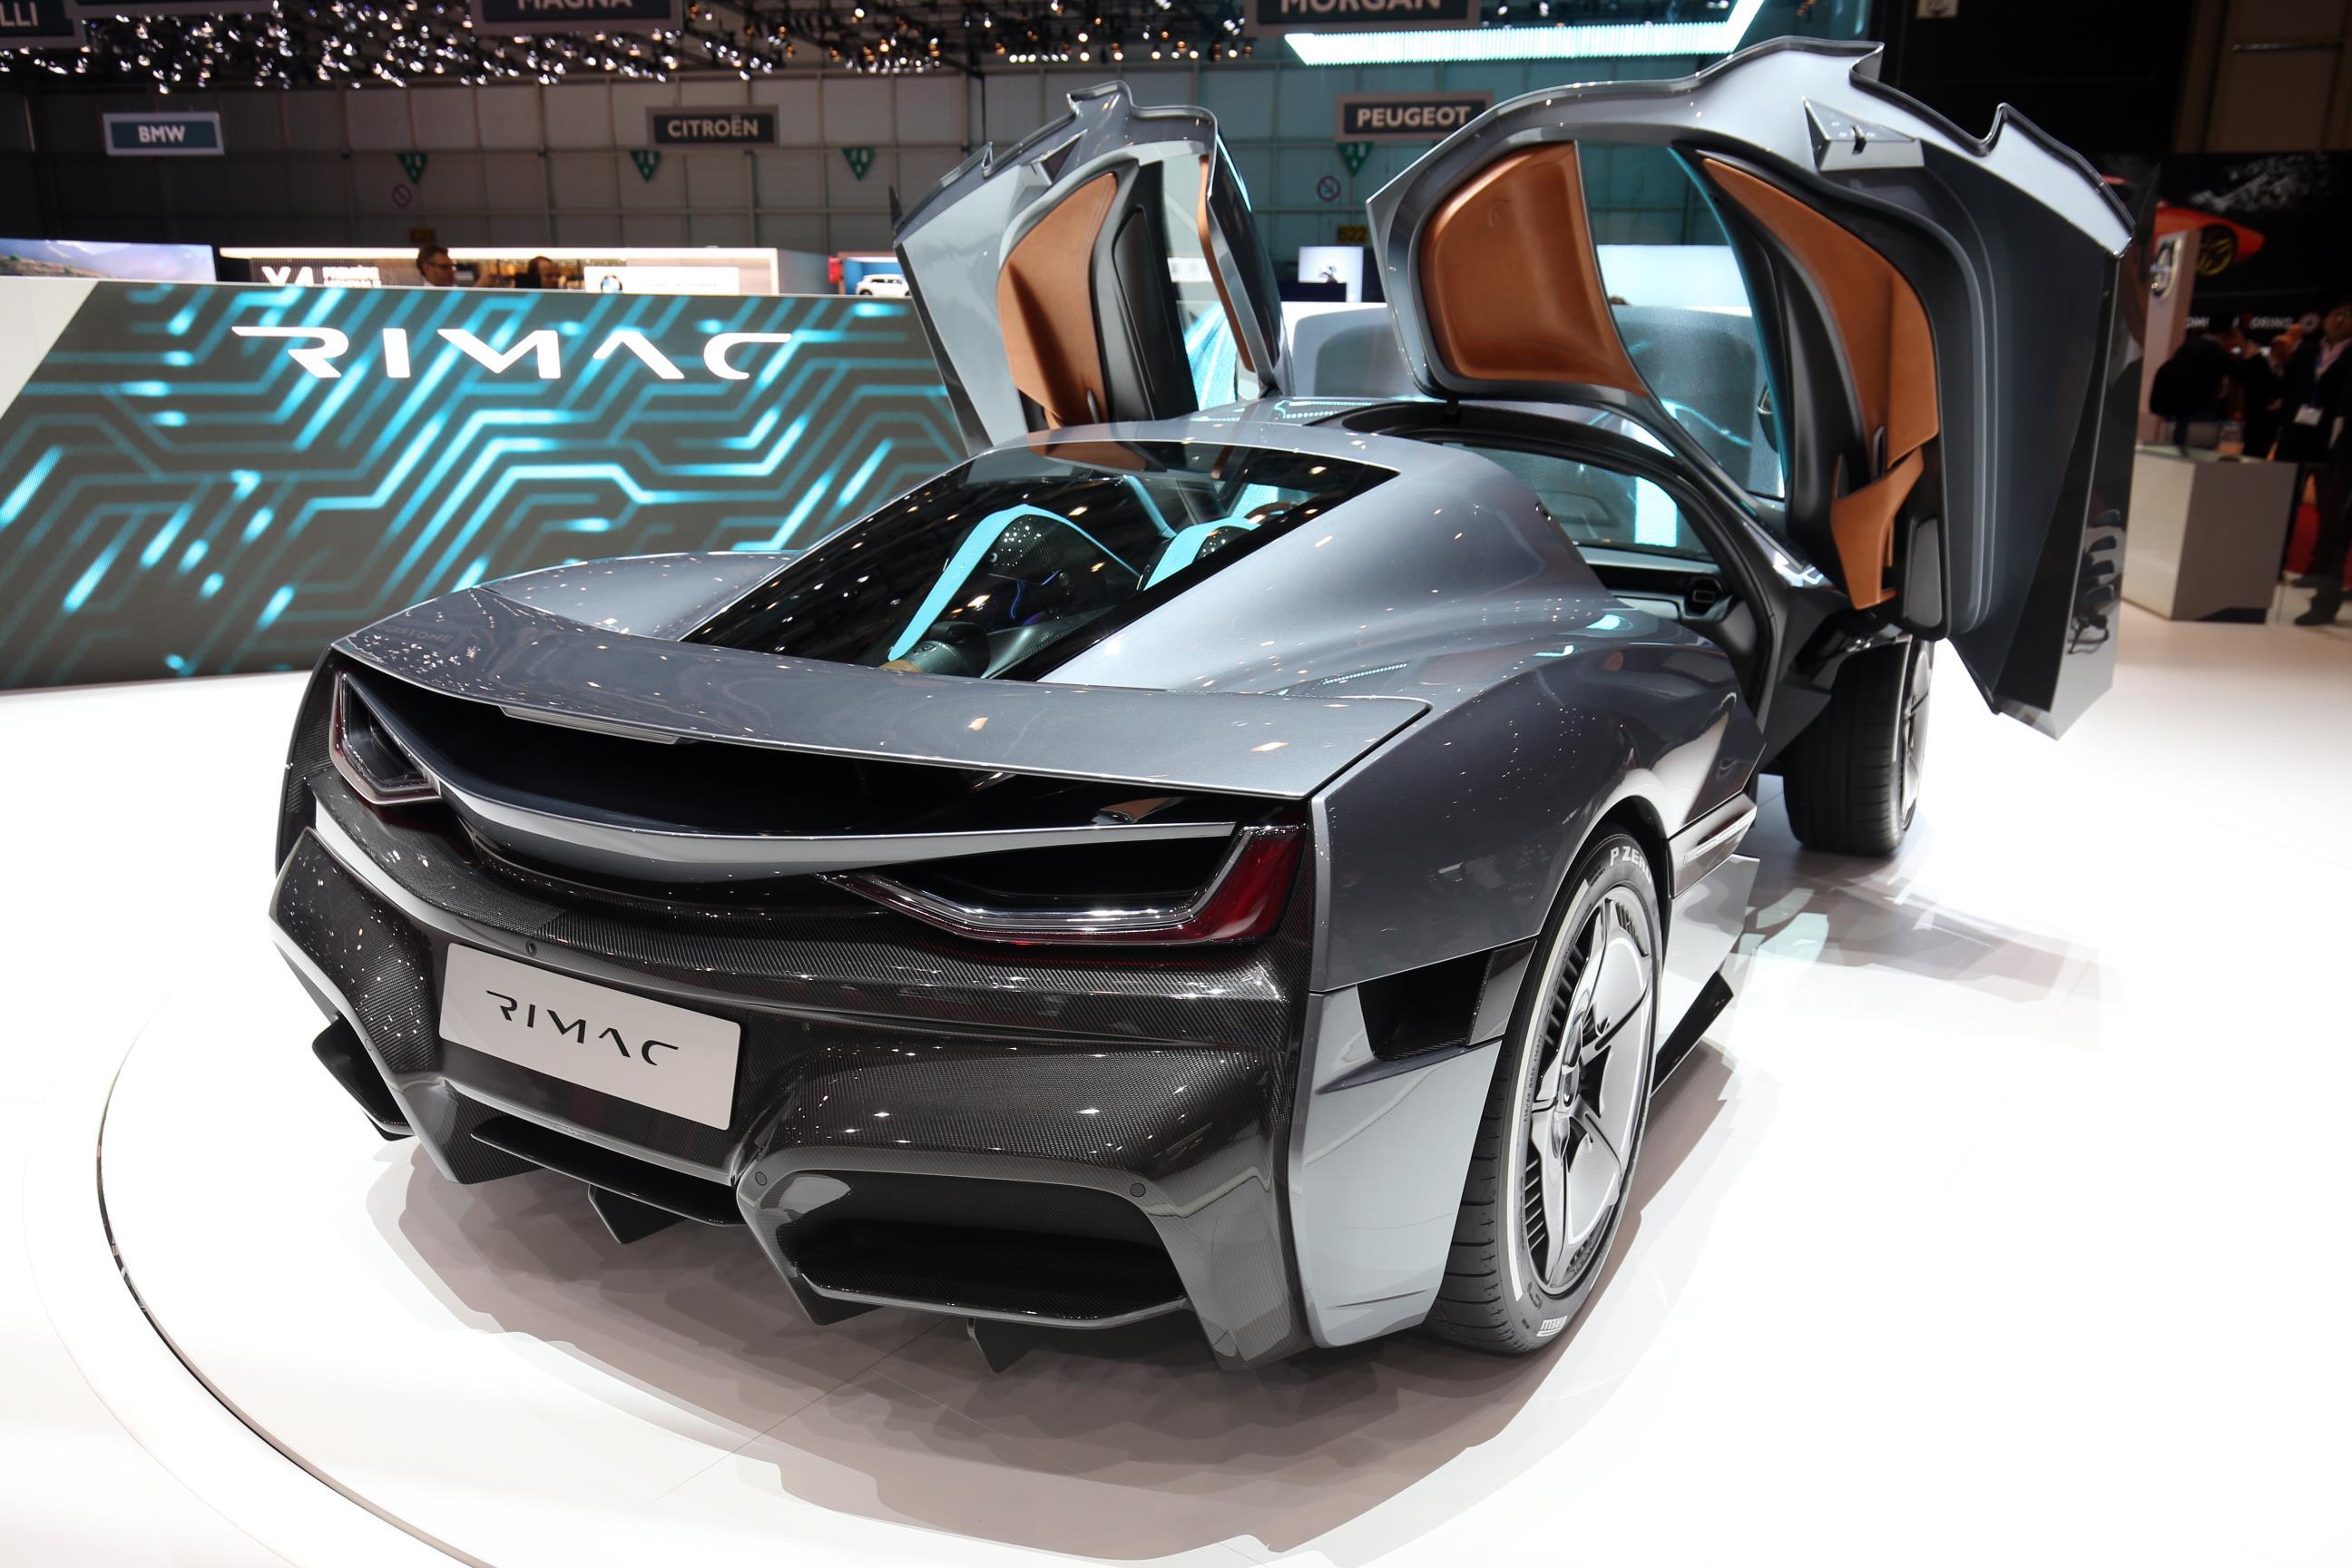 Geneva Motor Show 2018 Mega Gallery Part 2 (288)